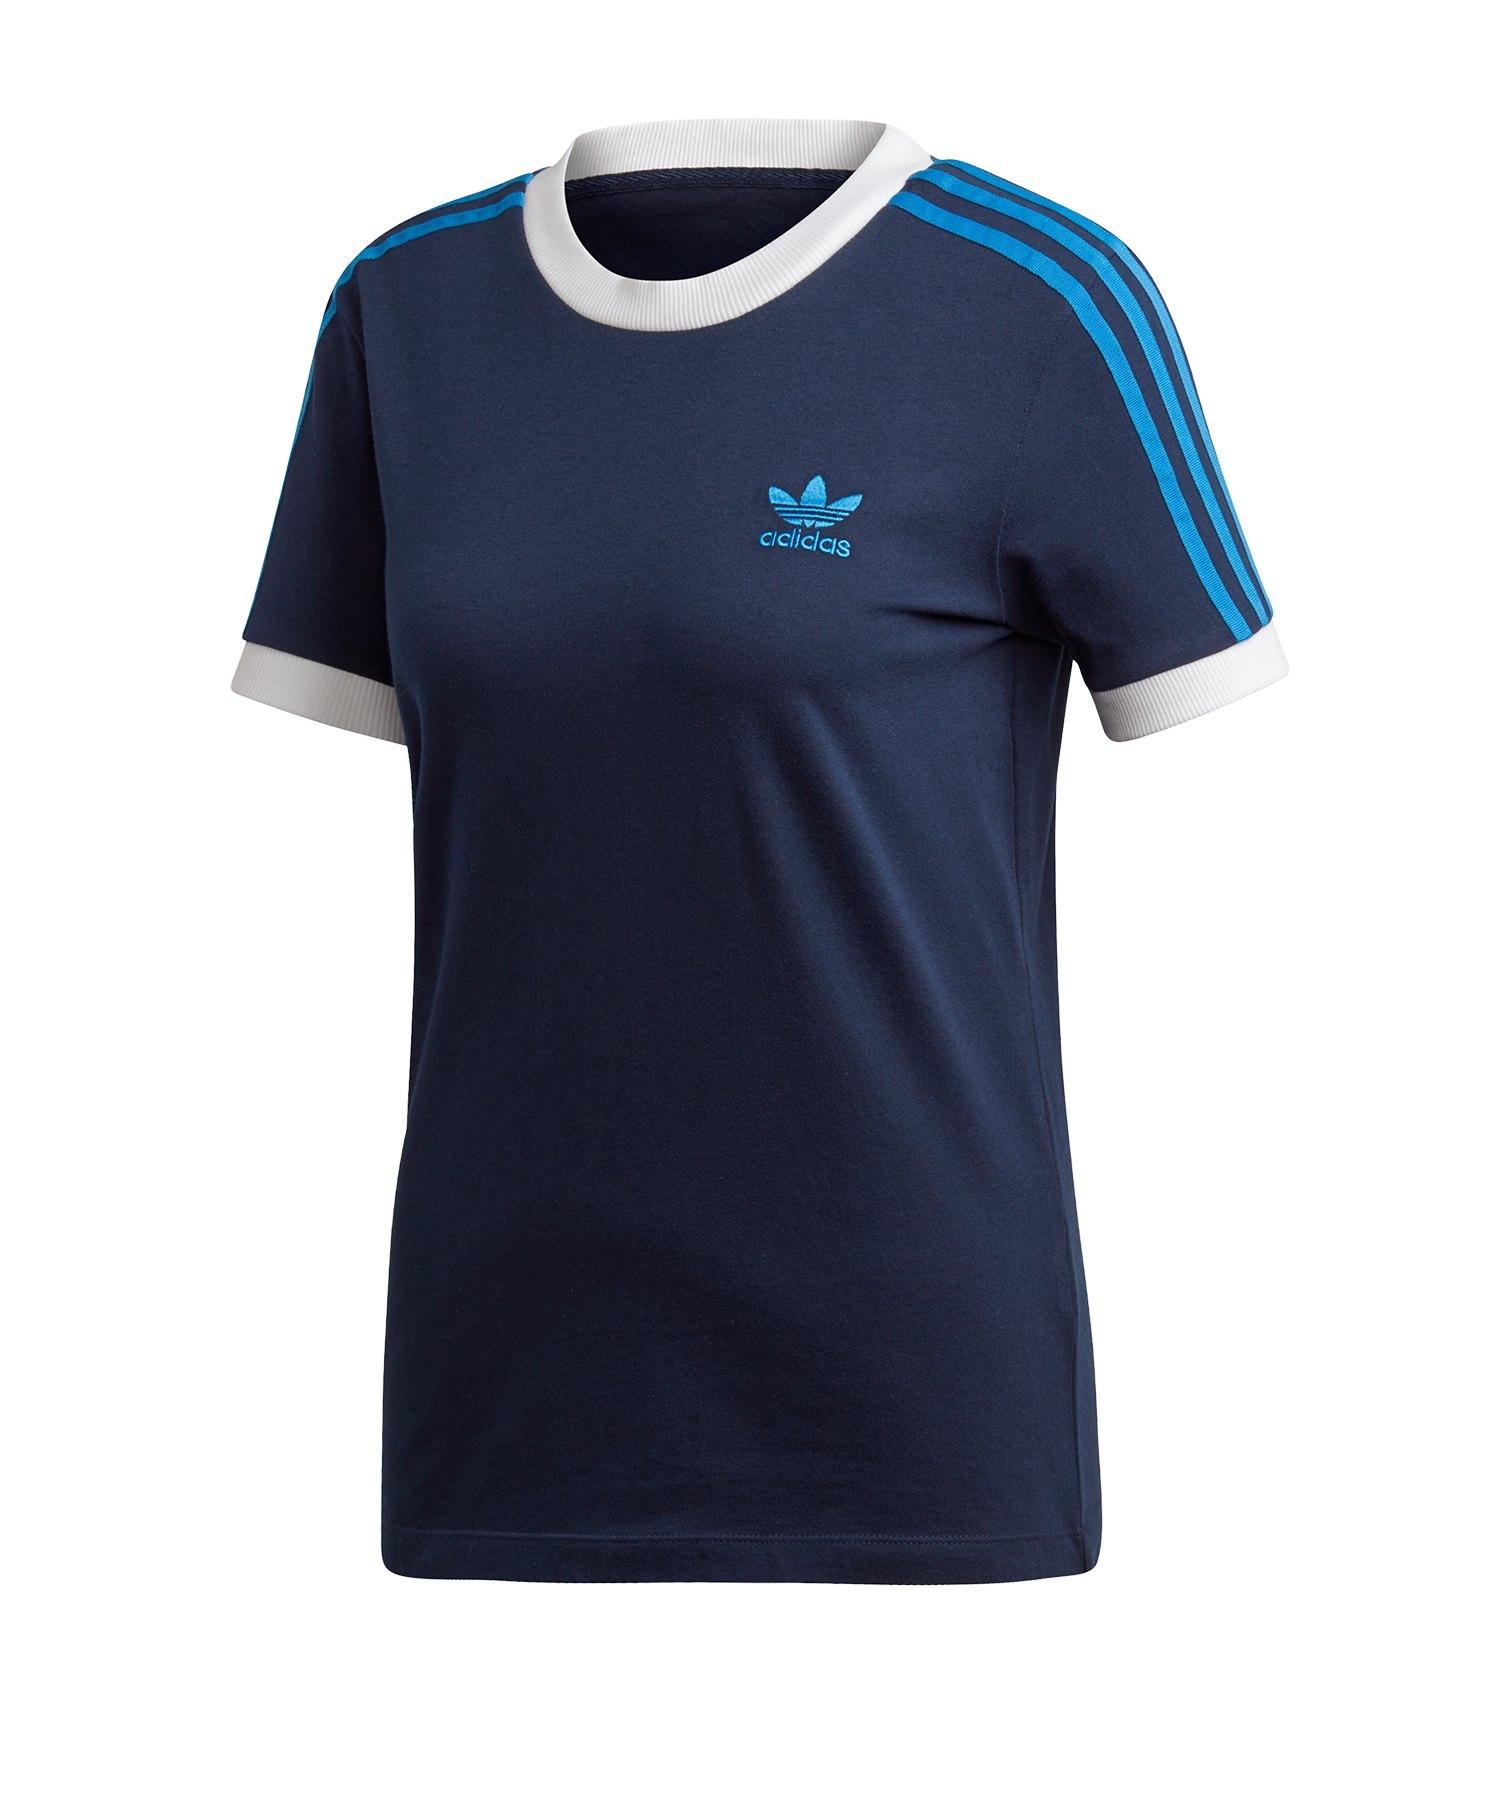 adidas Originals 3 Stripes T Shirt Damen Blau